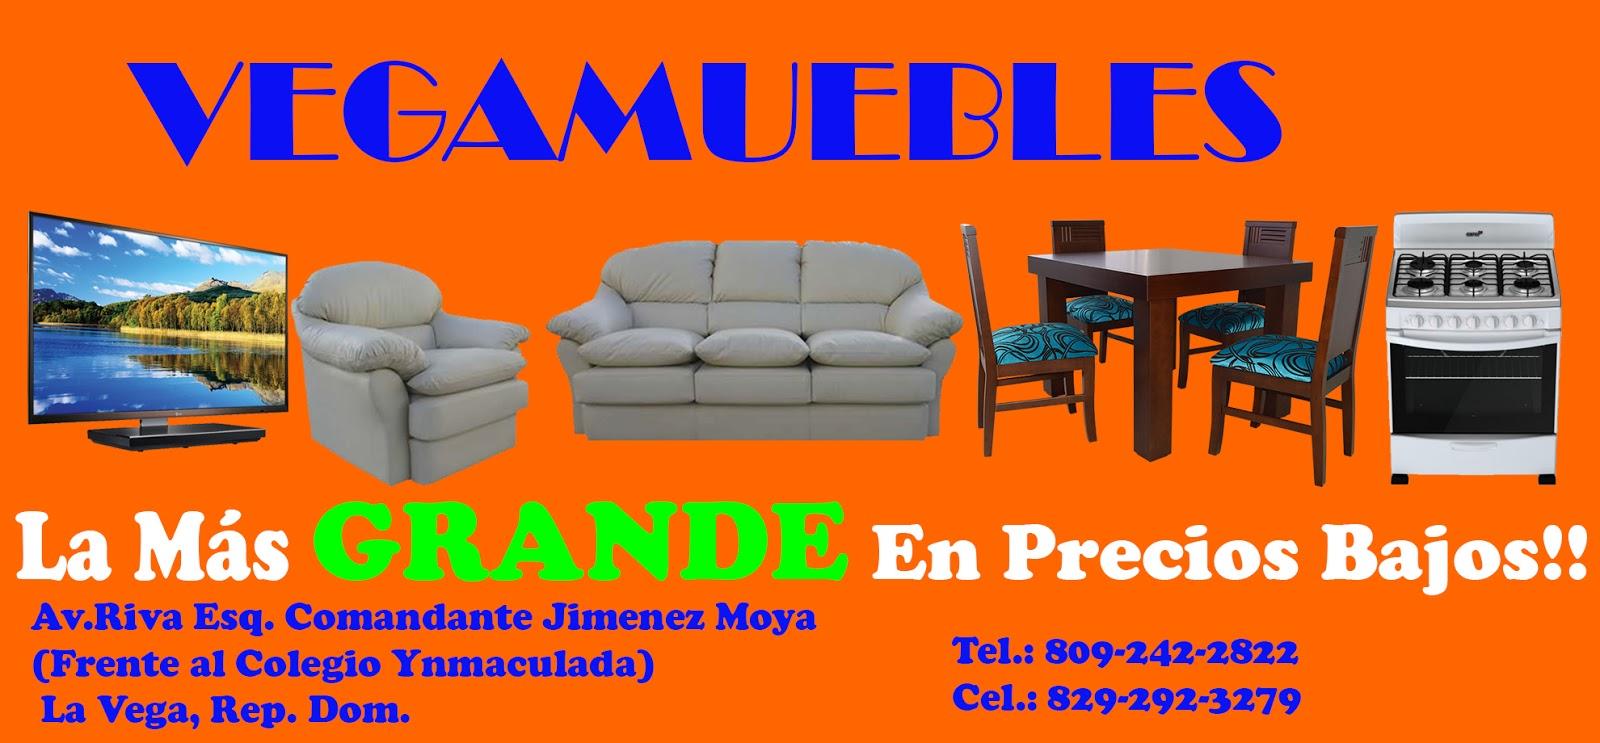 10 10 16 An Lisis Con Carlos Fern Ndez # Muebles En Nagua Republica Dominicana